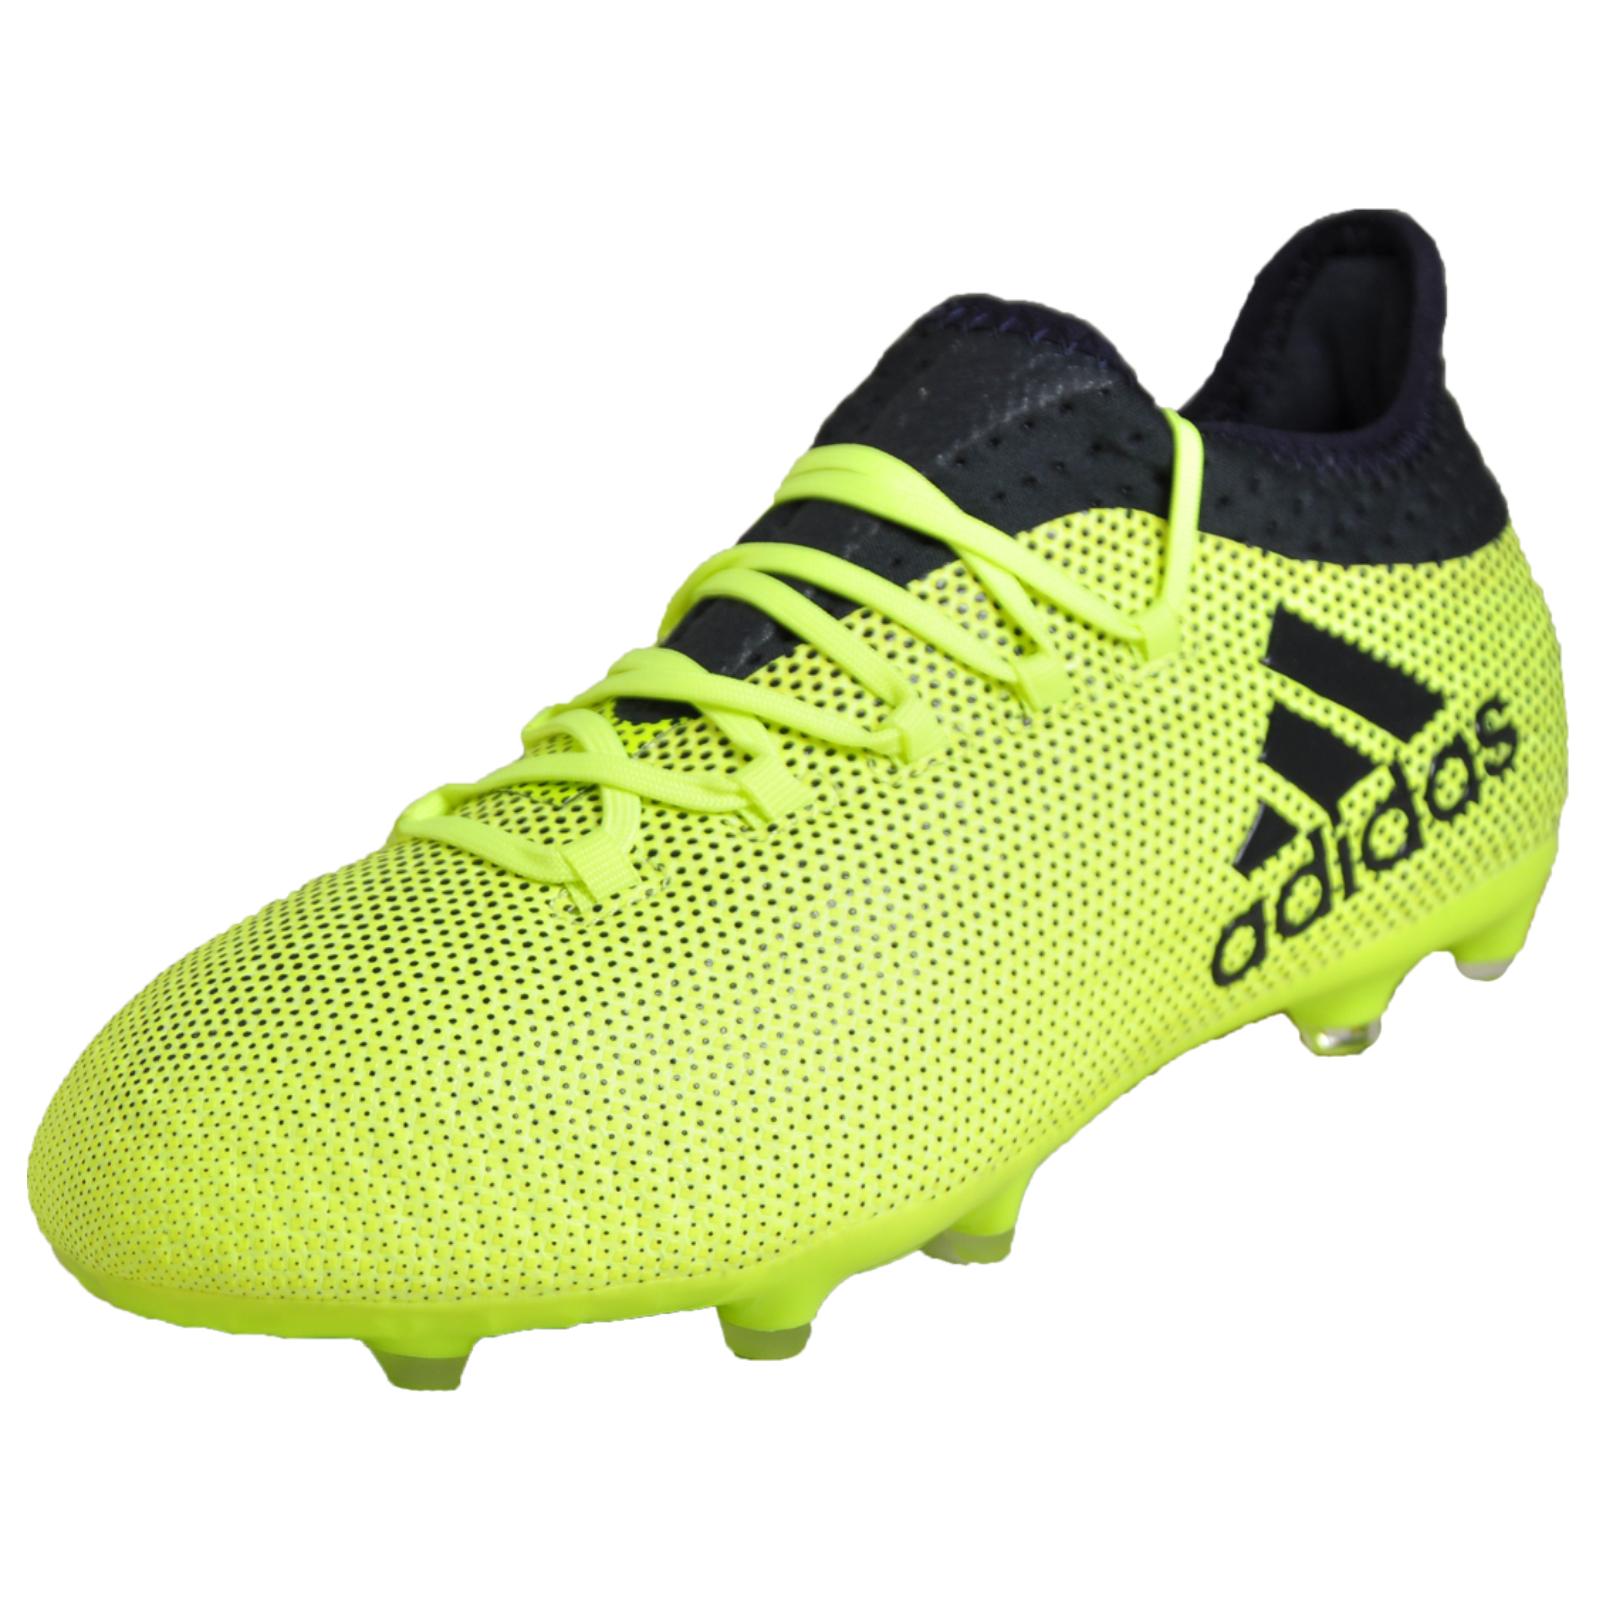 168554f6468 Adidas X 17.1 FG Junior Kids Boys Football Soccer Boots Yellow